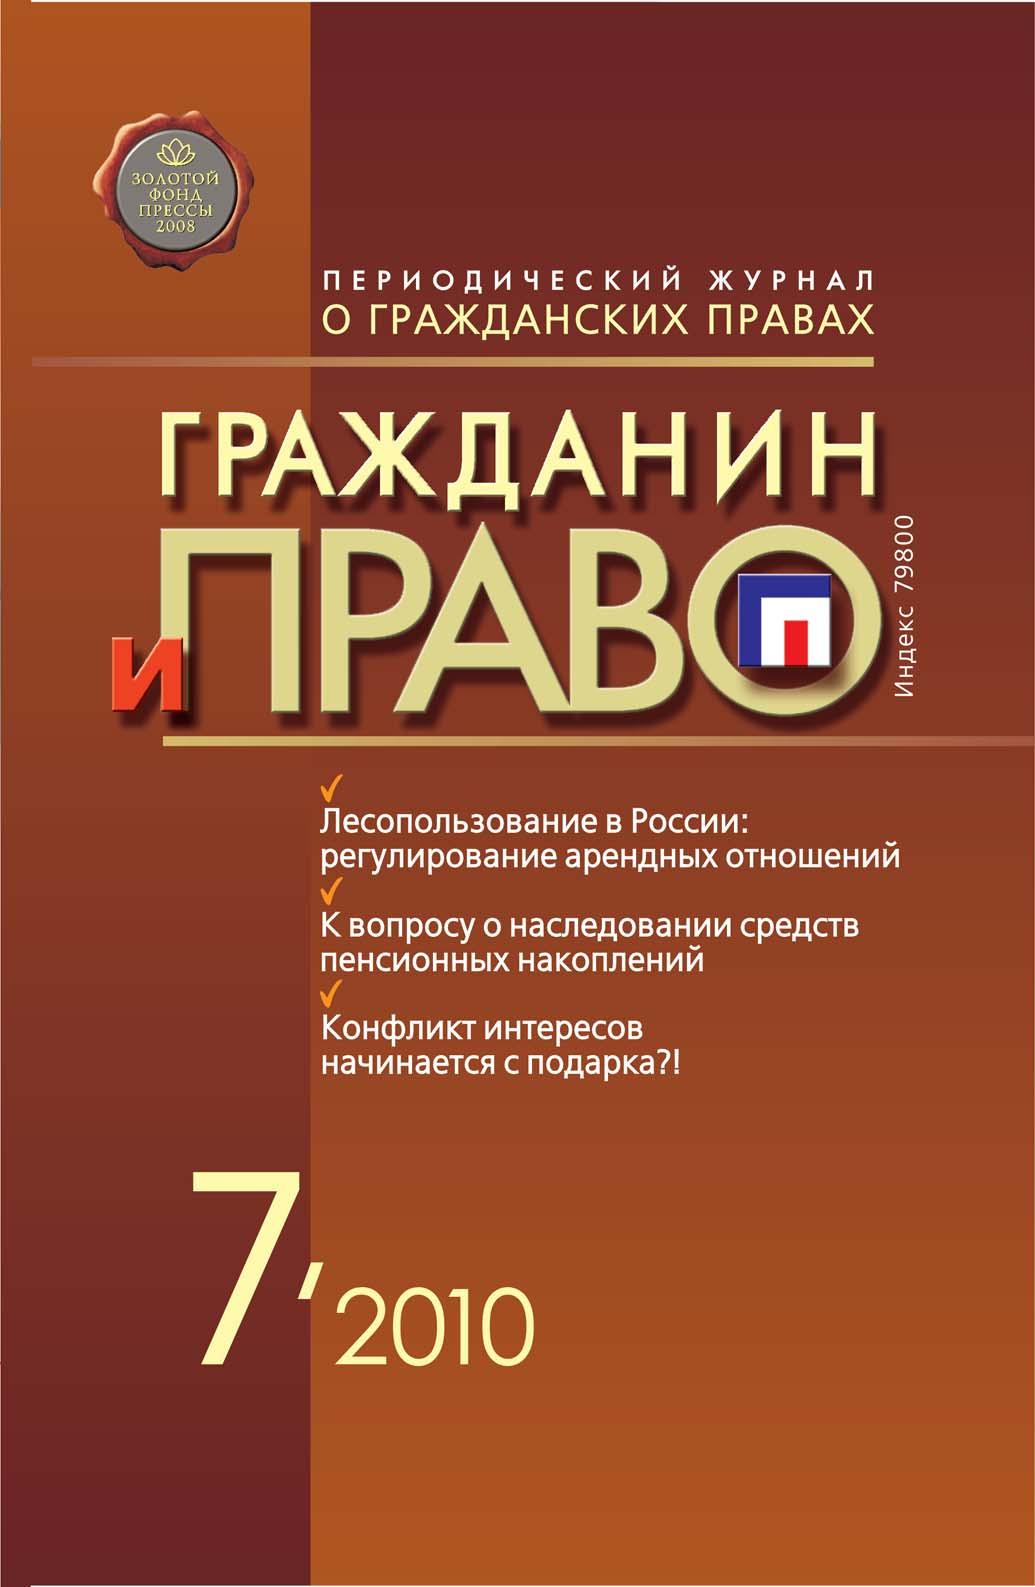 Гражданин и право №07/2010